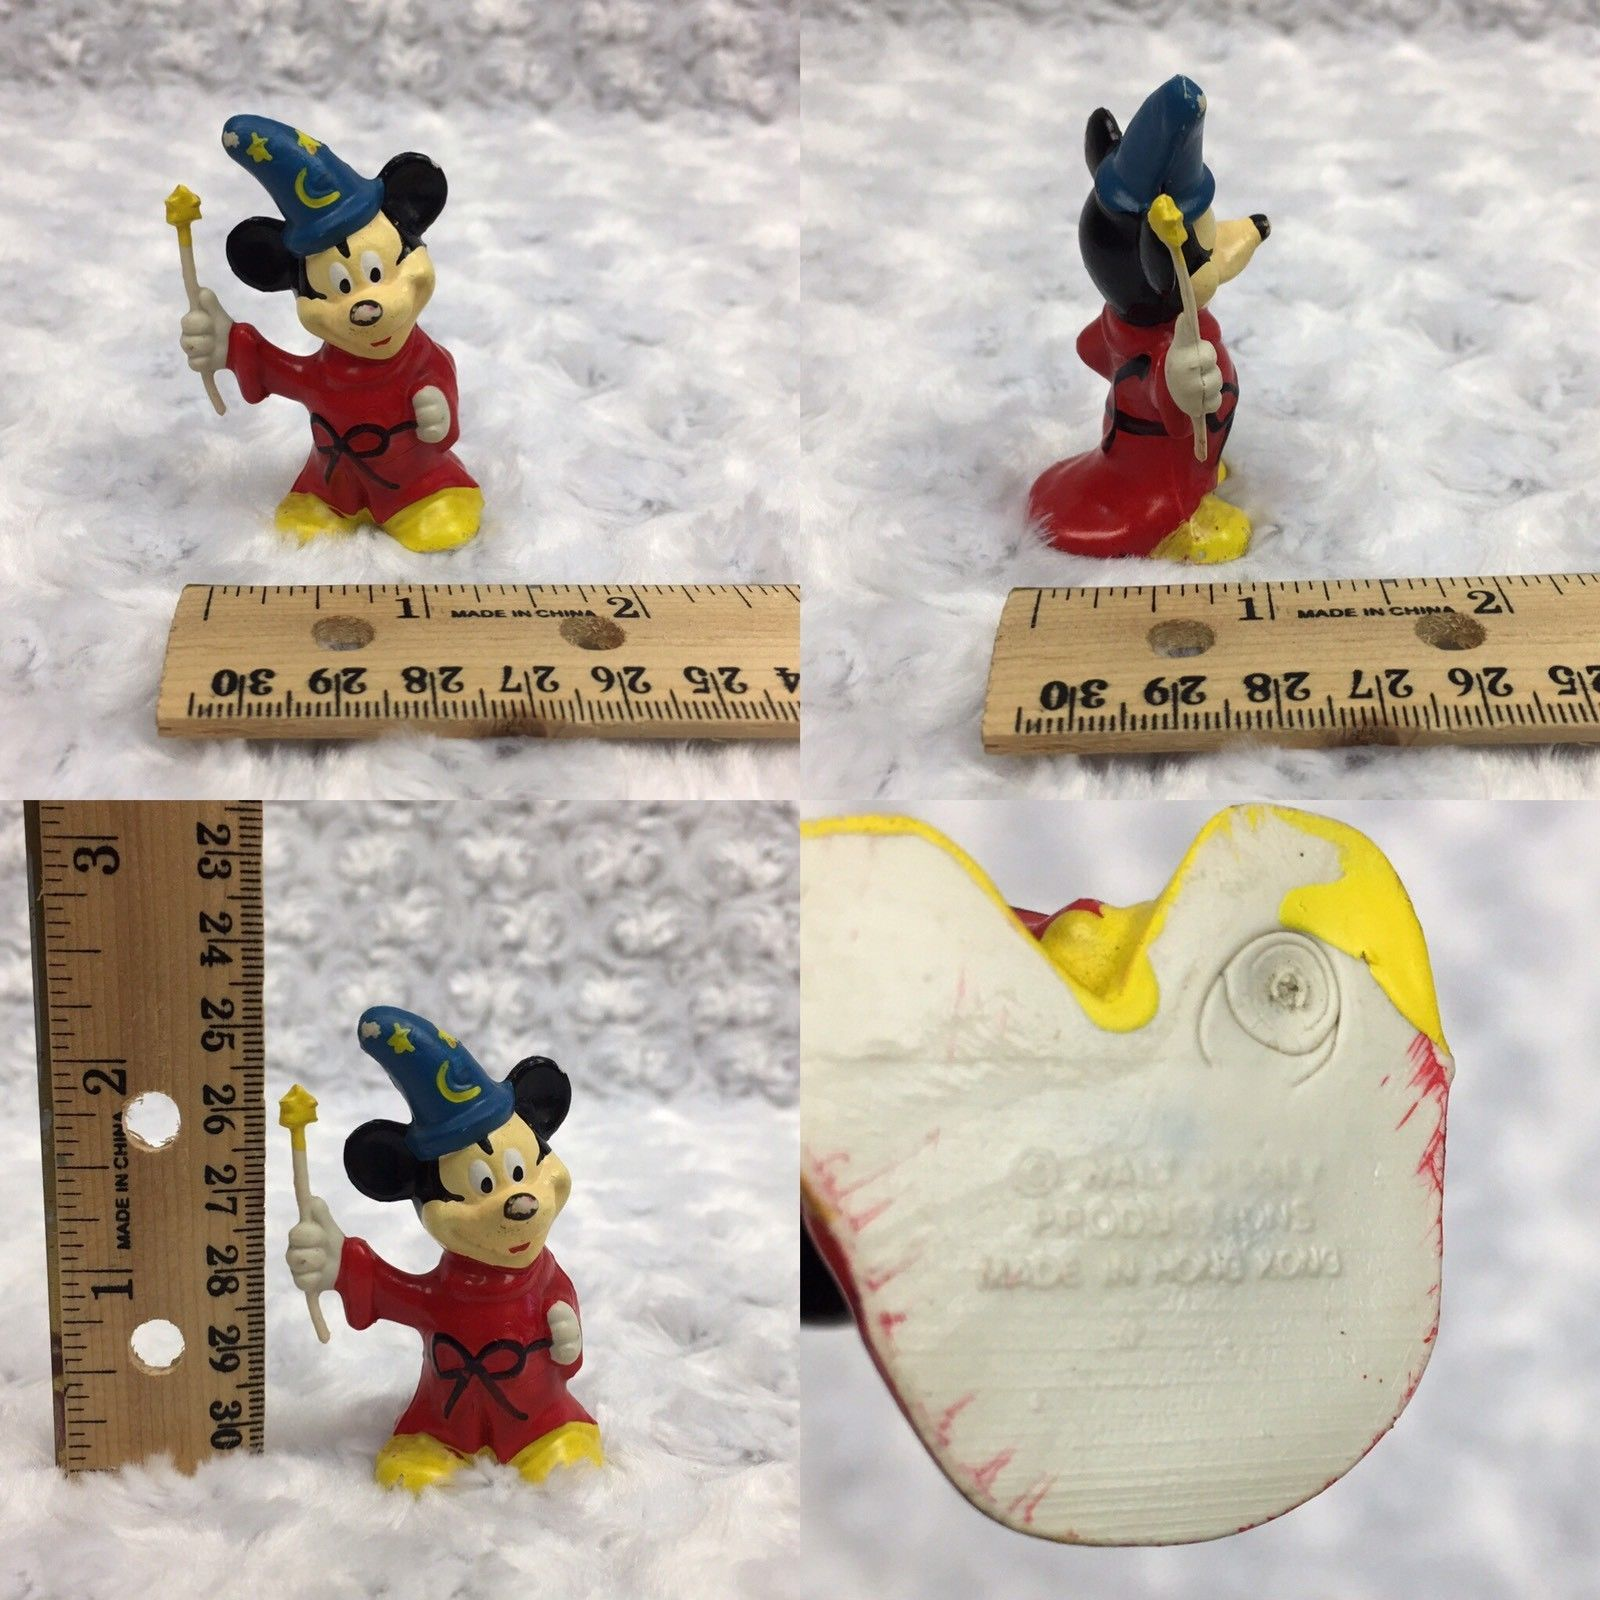 Mickey Mouse Fantasia Walt Disney Vintage 1980s Applause Small Figurine Toy